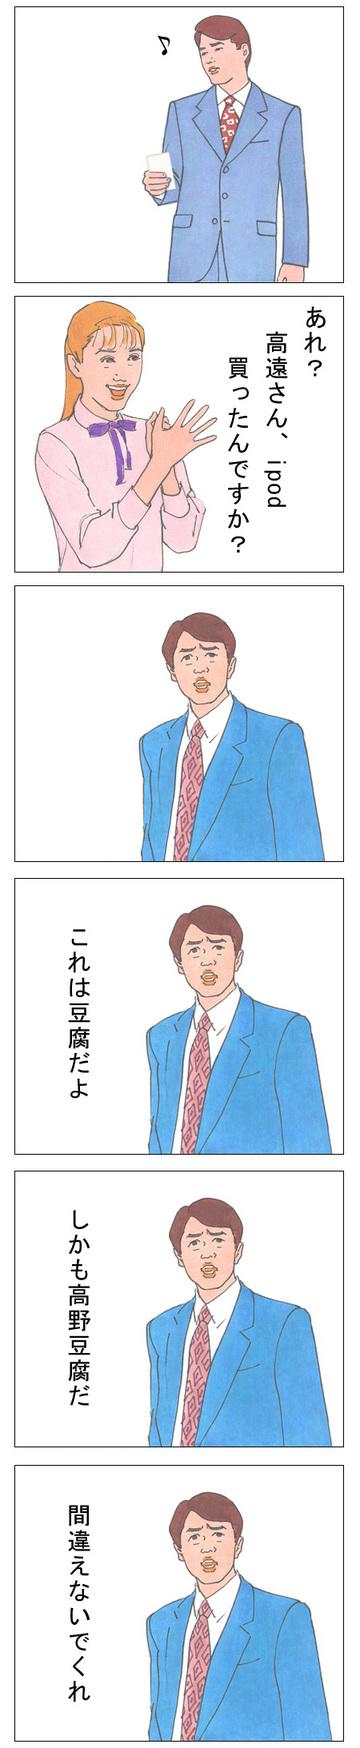 9f6794f0-s.jpg